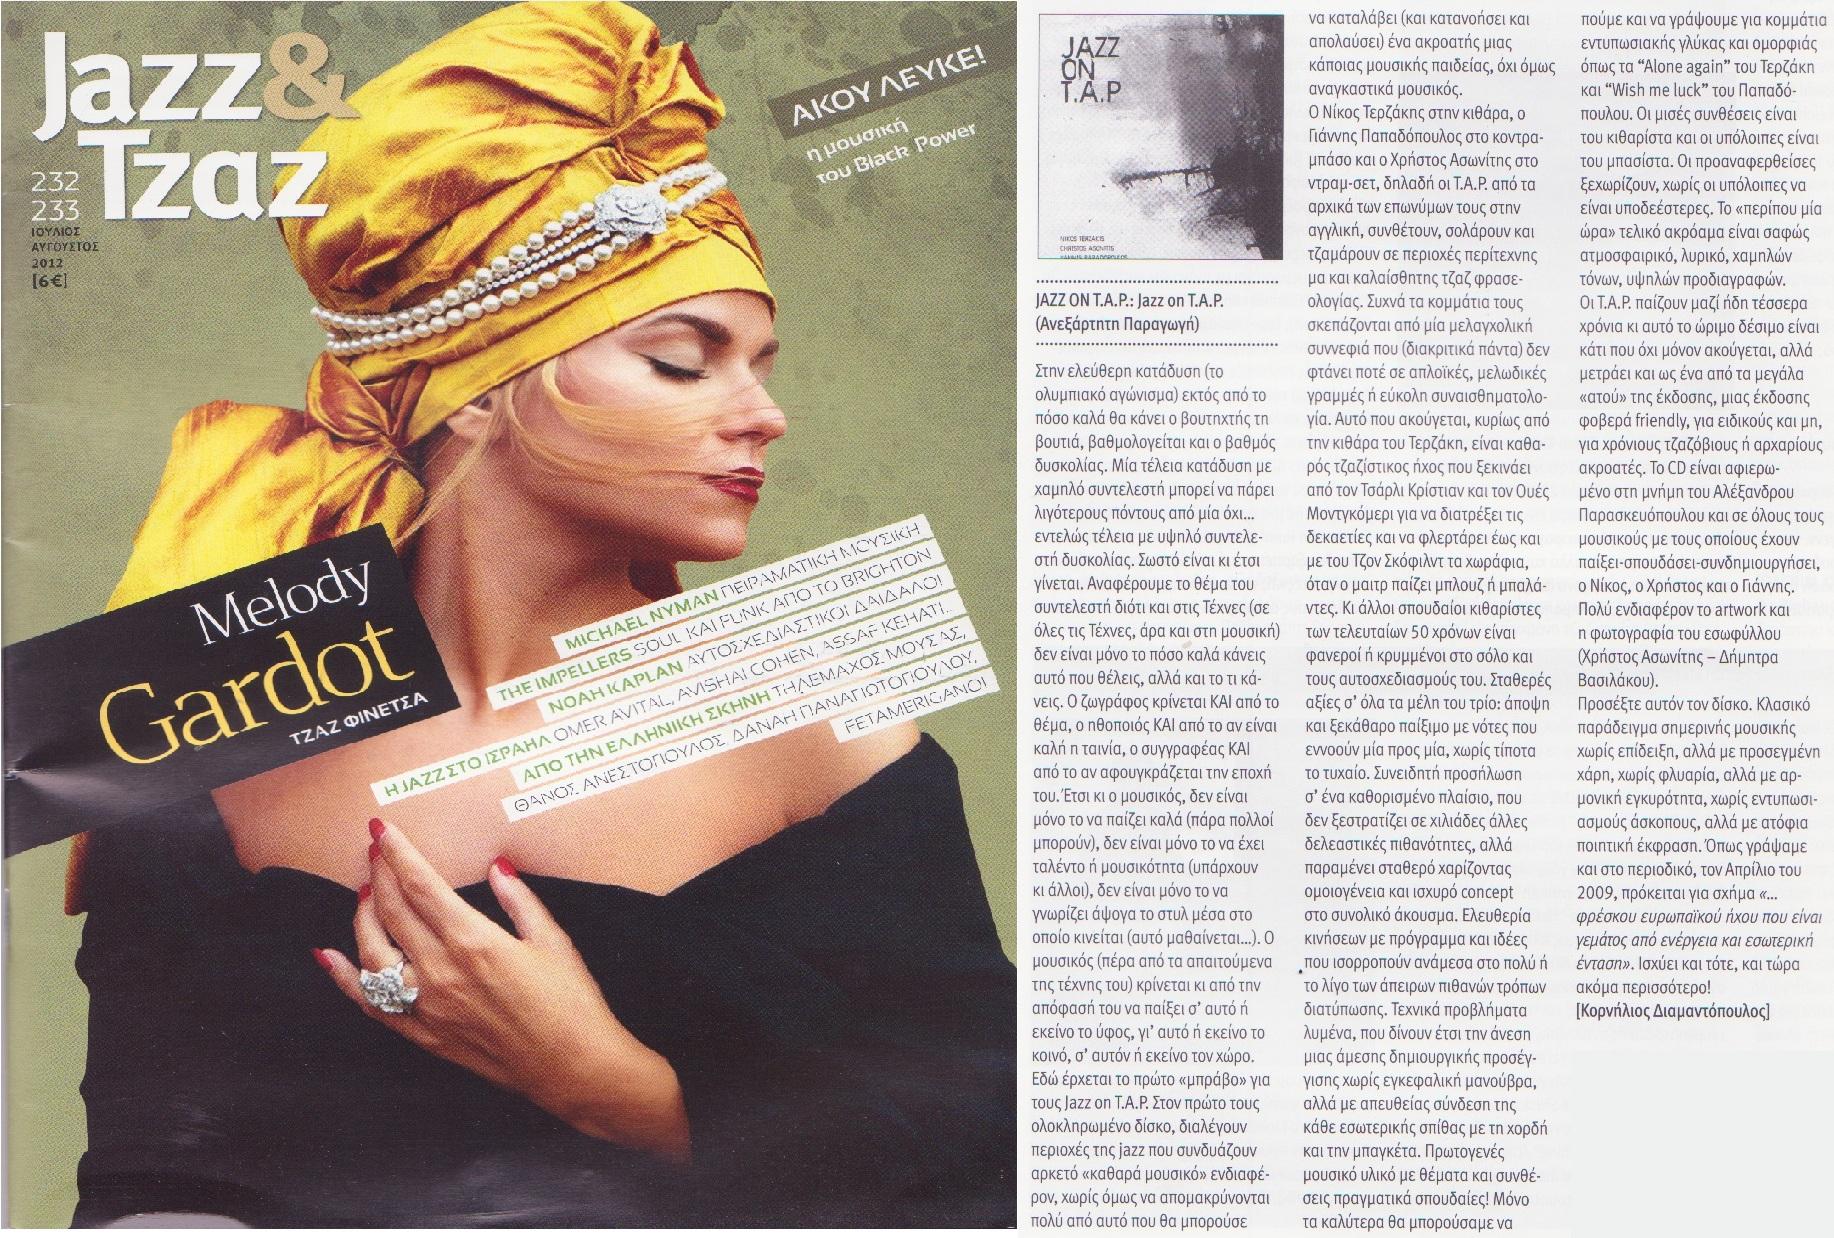 Album review (in Greek)